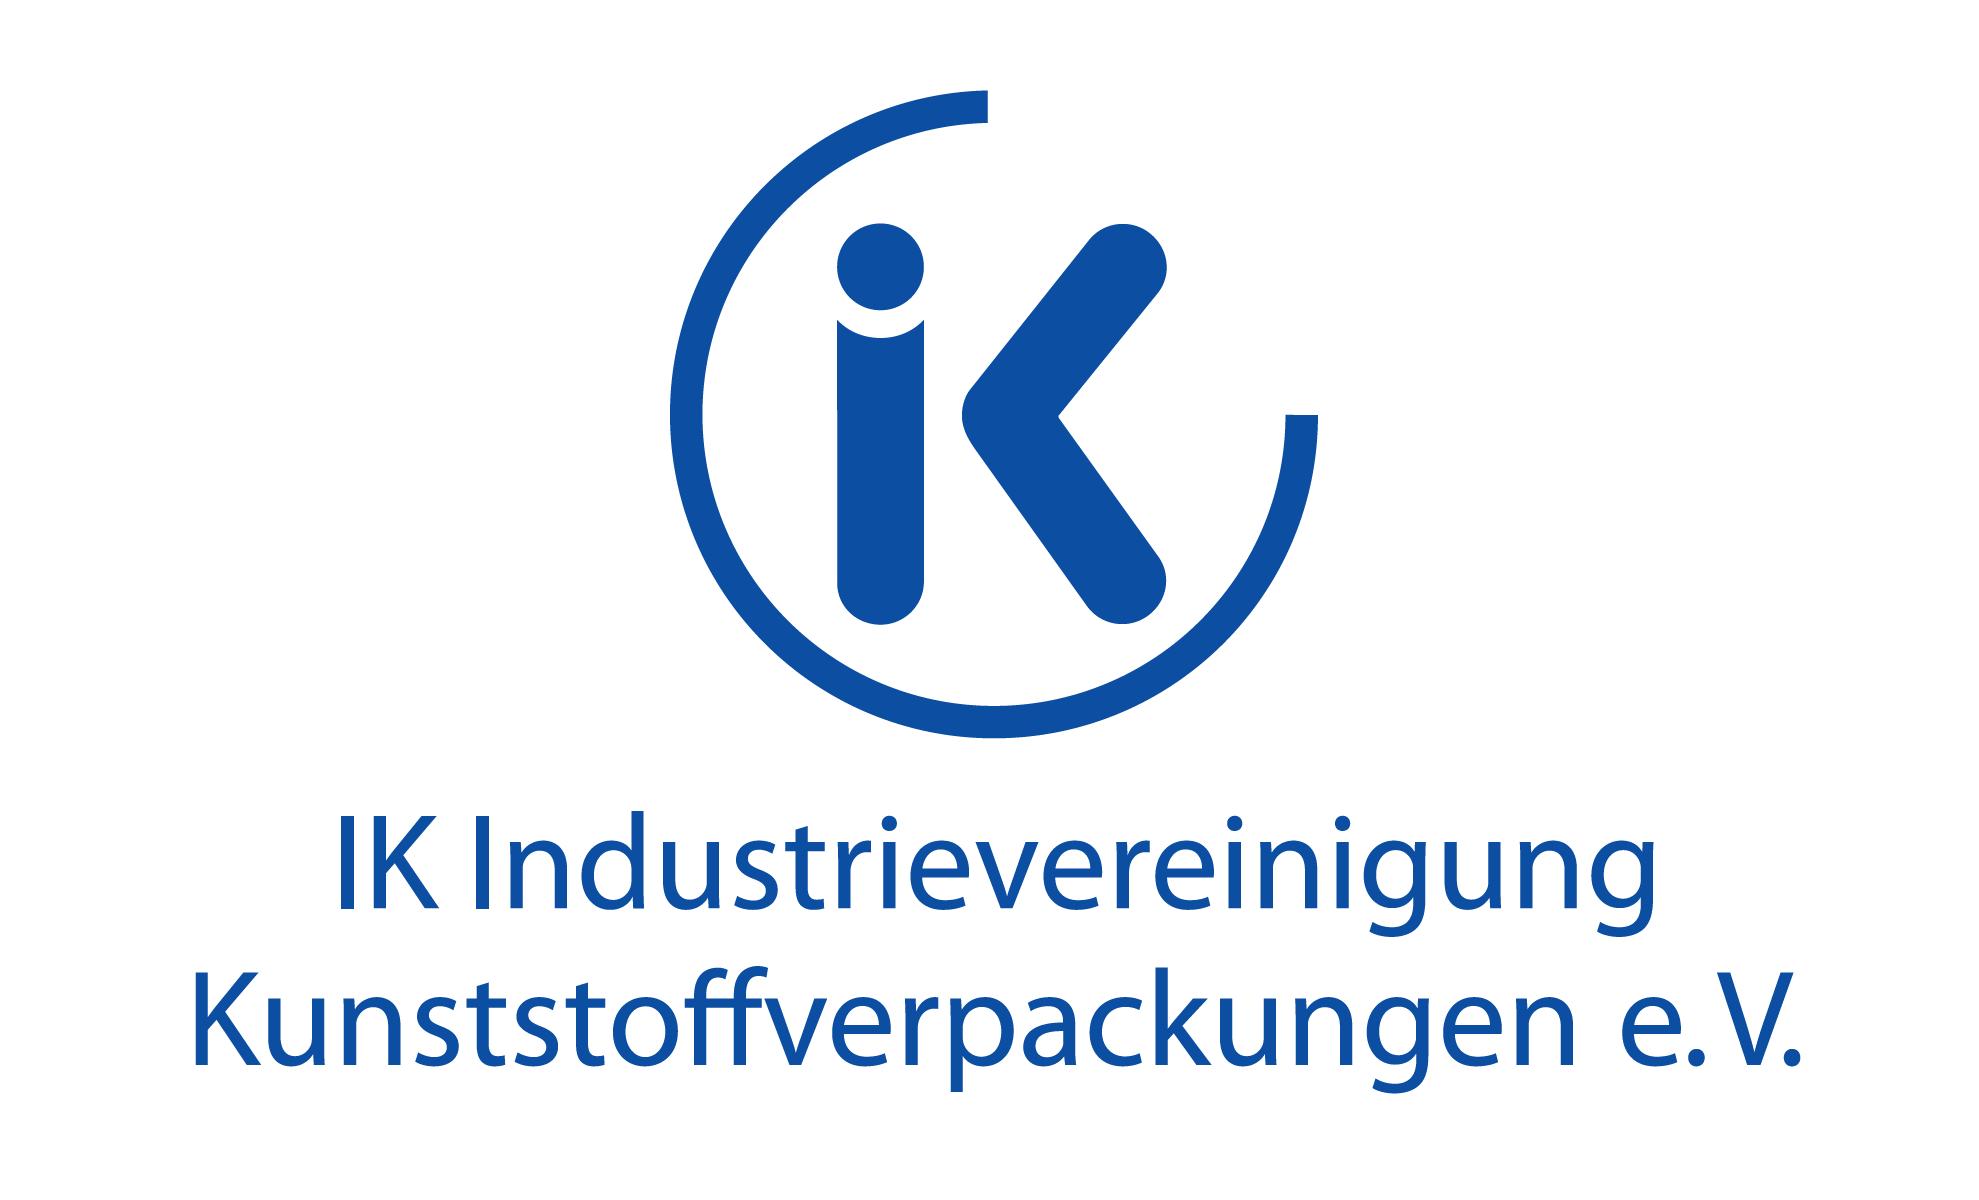 IK - Industrievereinigung Kunststoffverpackungen e.V